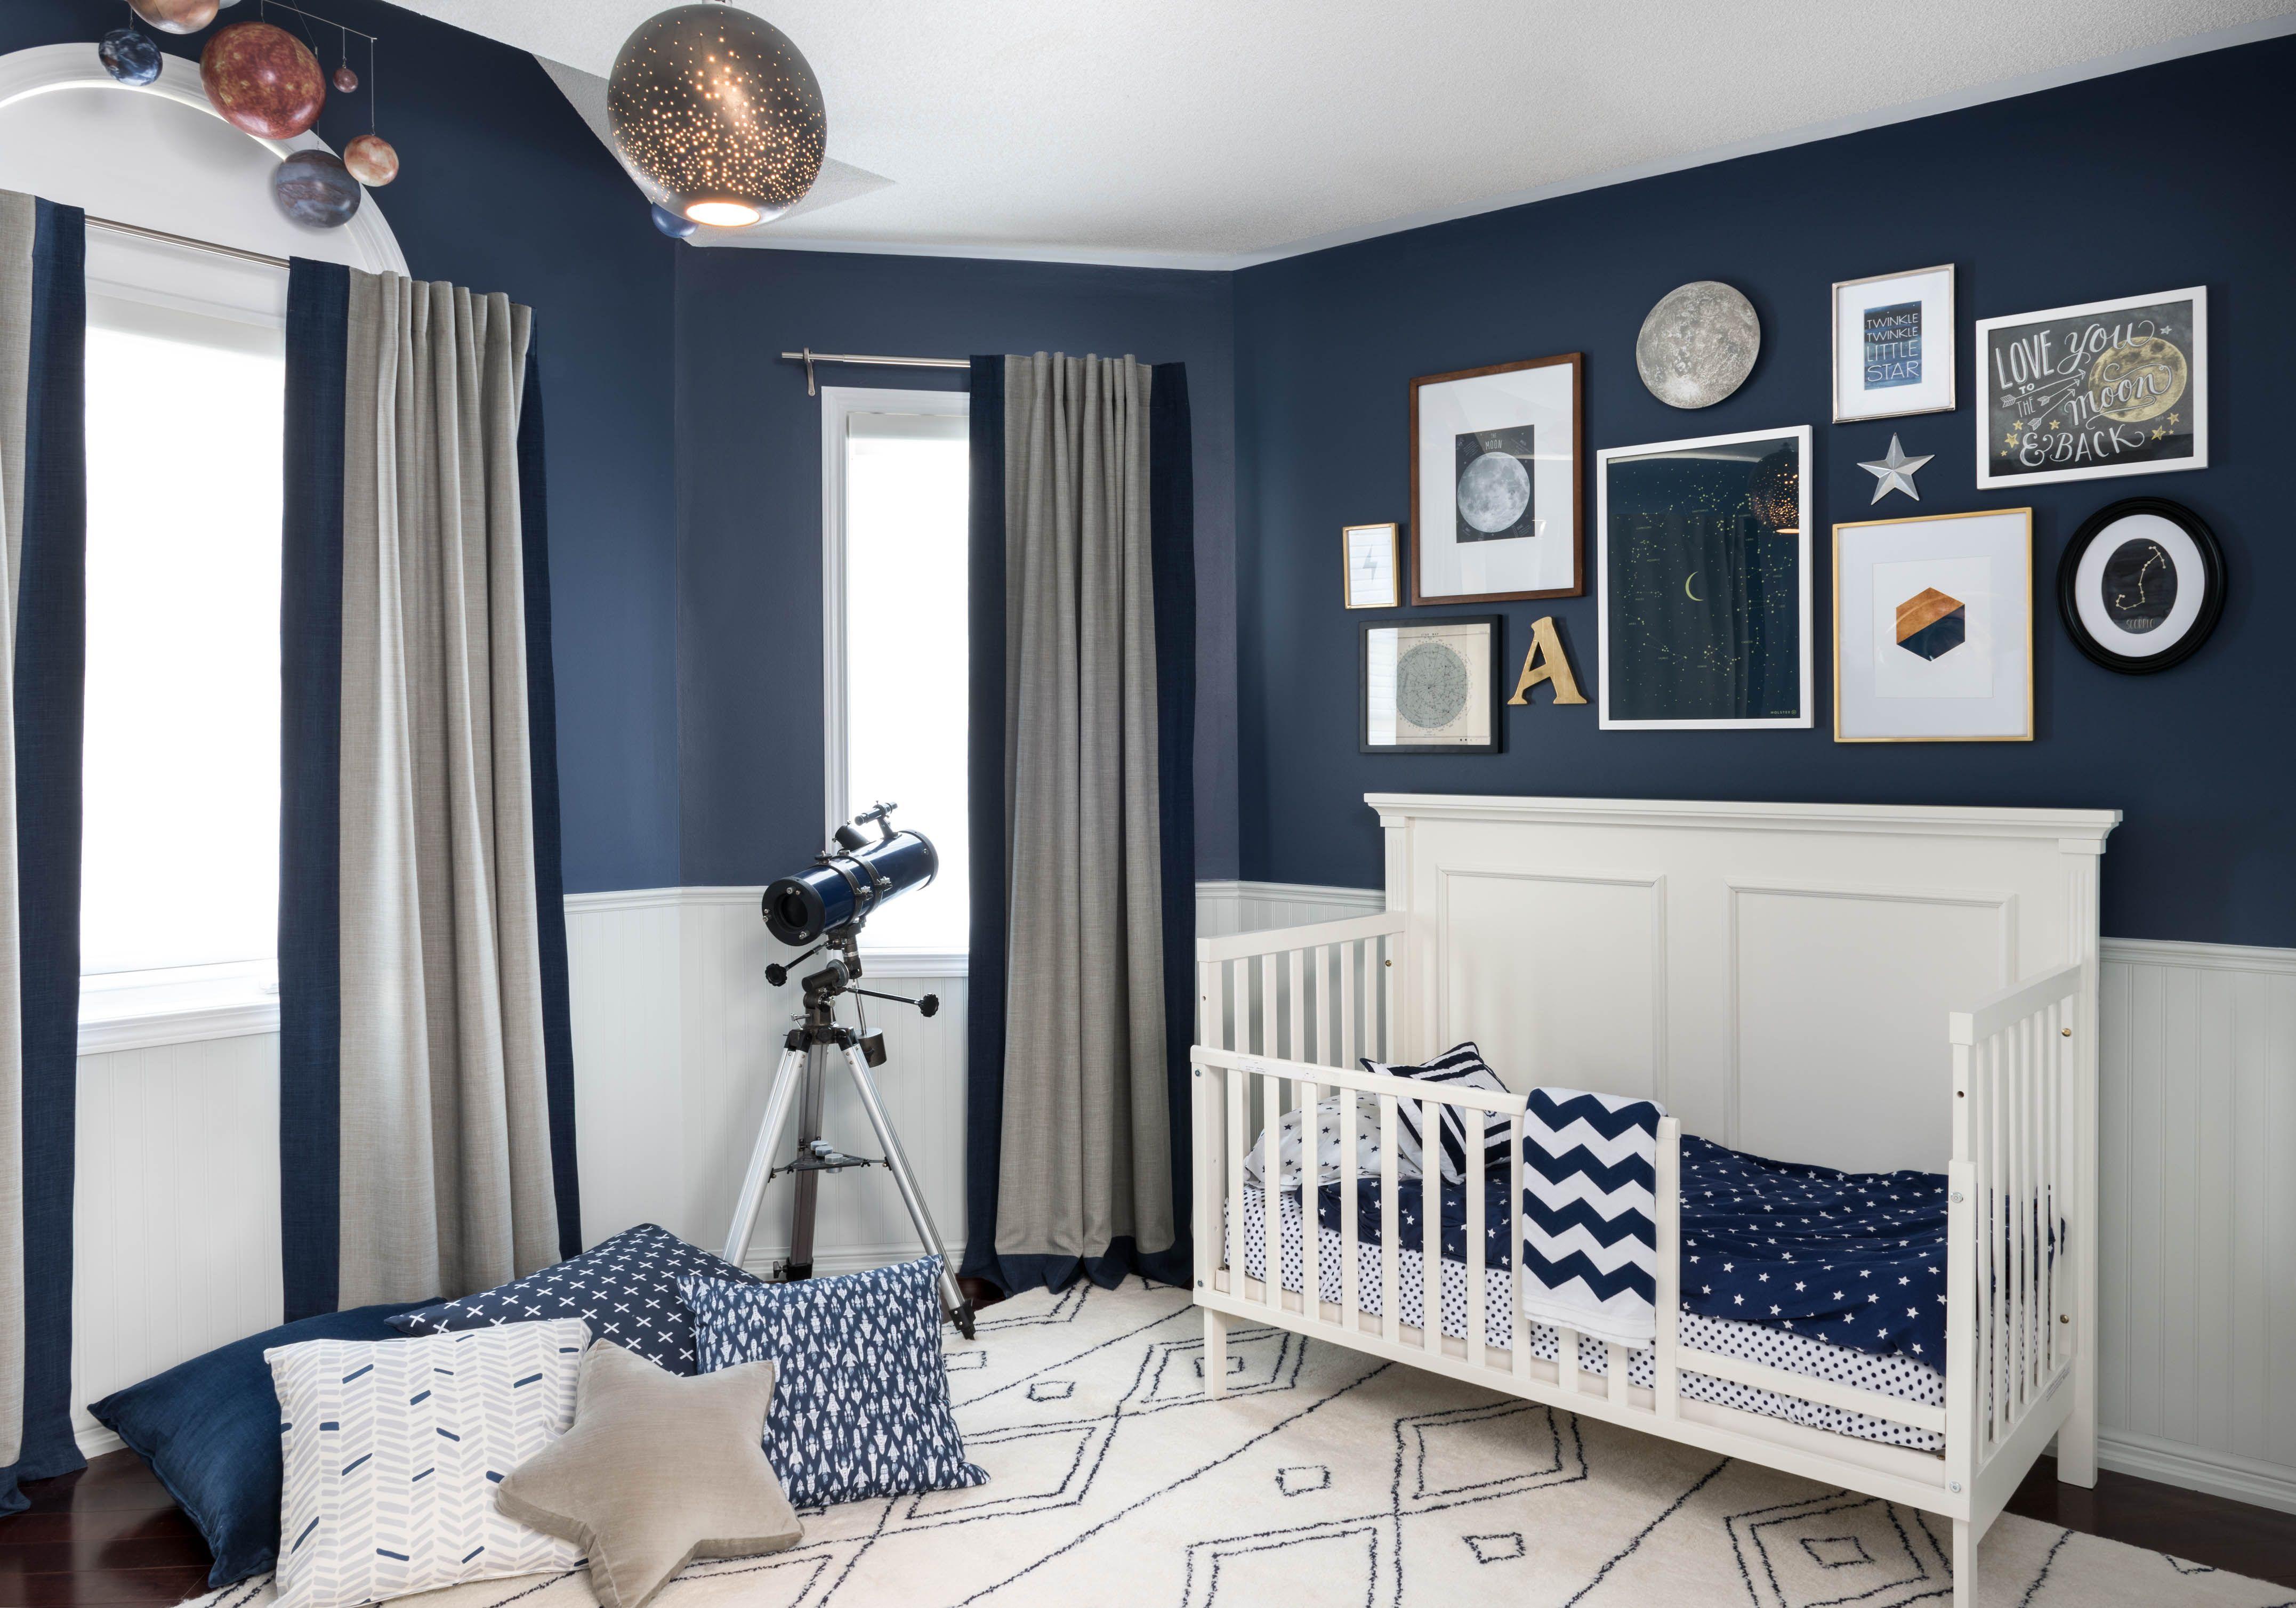 Celestial inspired boys room babykamer gezellige woonkamers en